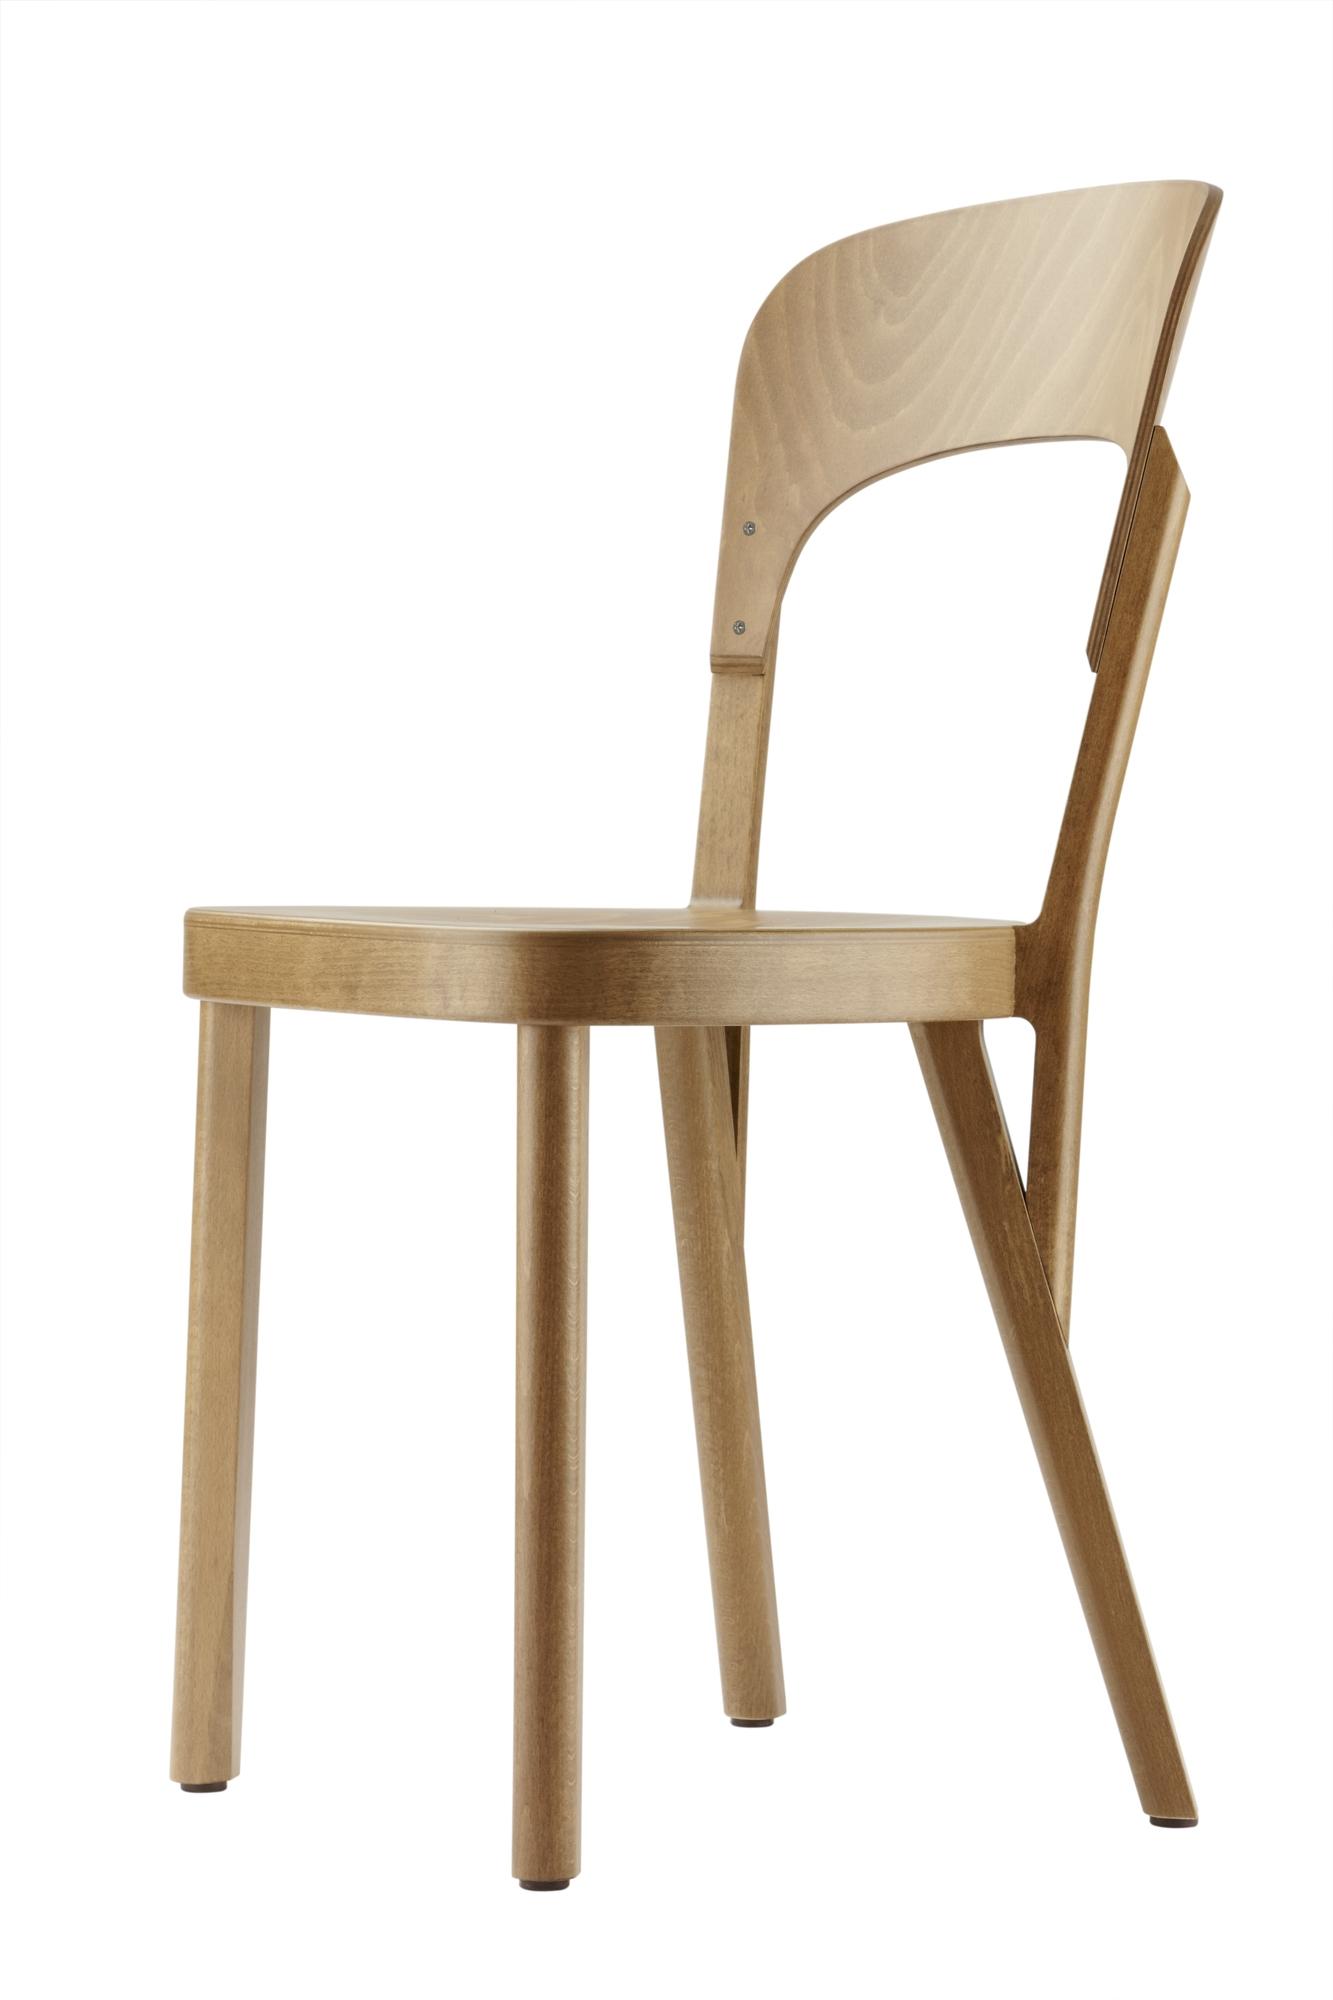 107 Holzstuhl Thonet